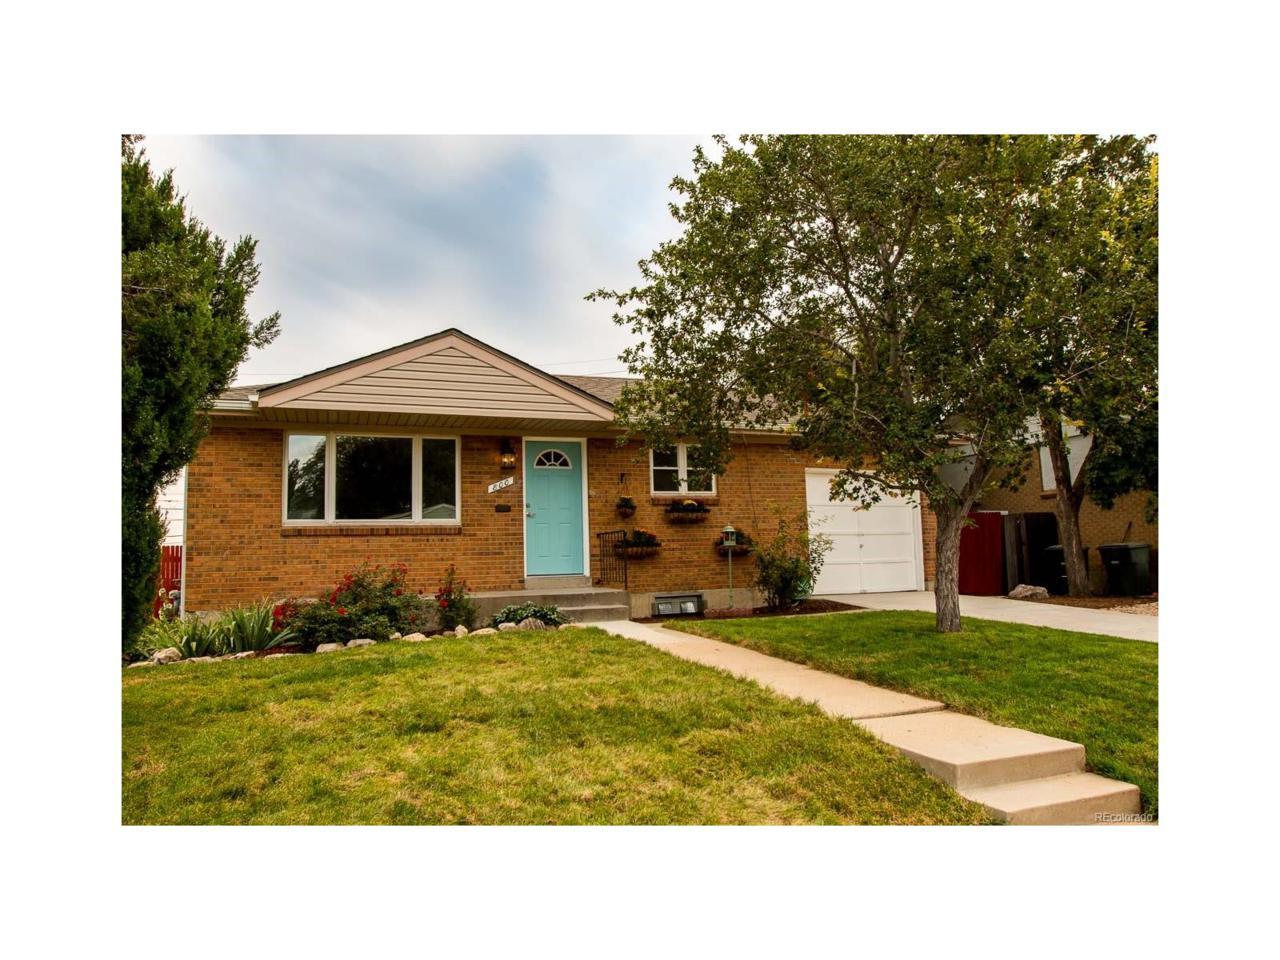 800 E 112th Place, Northglenn, CO 80233 (#6424692) :: Thrive Real Estate Group